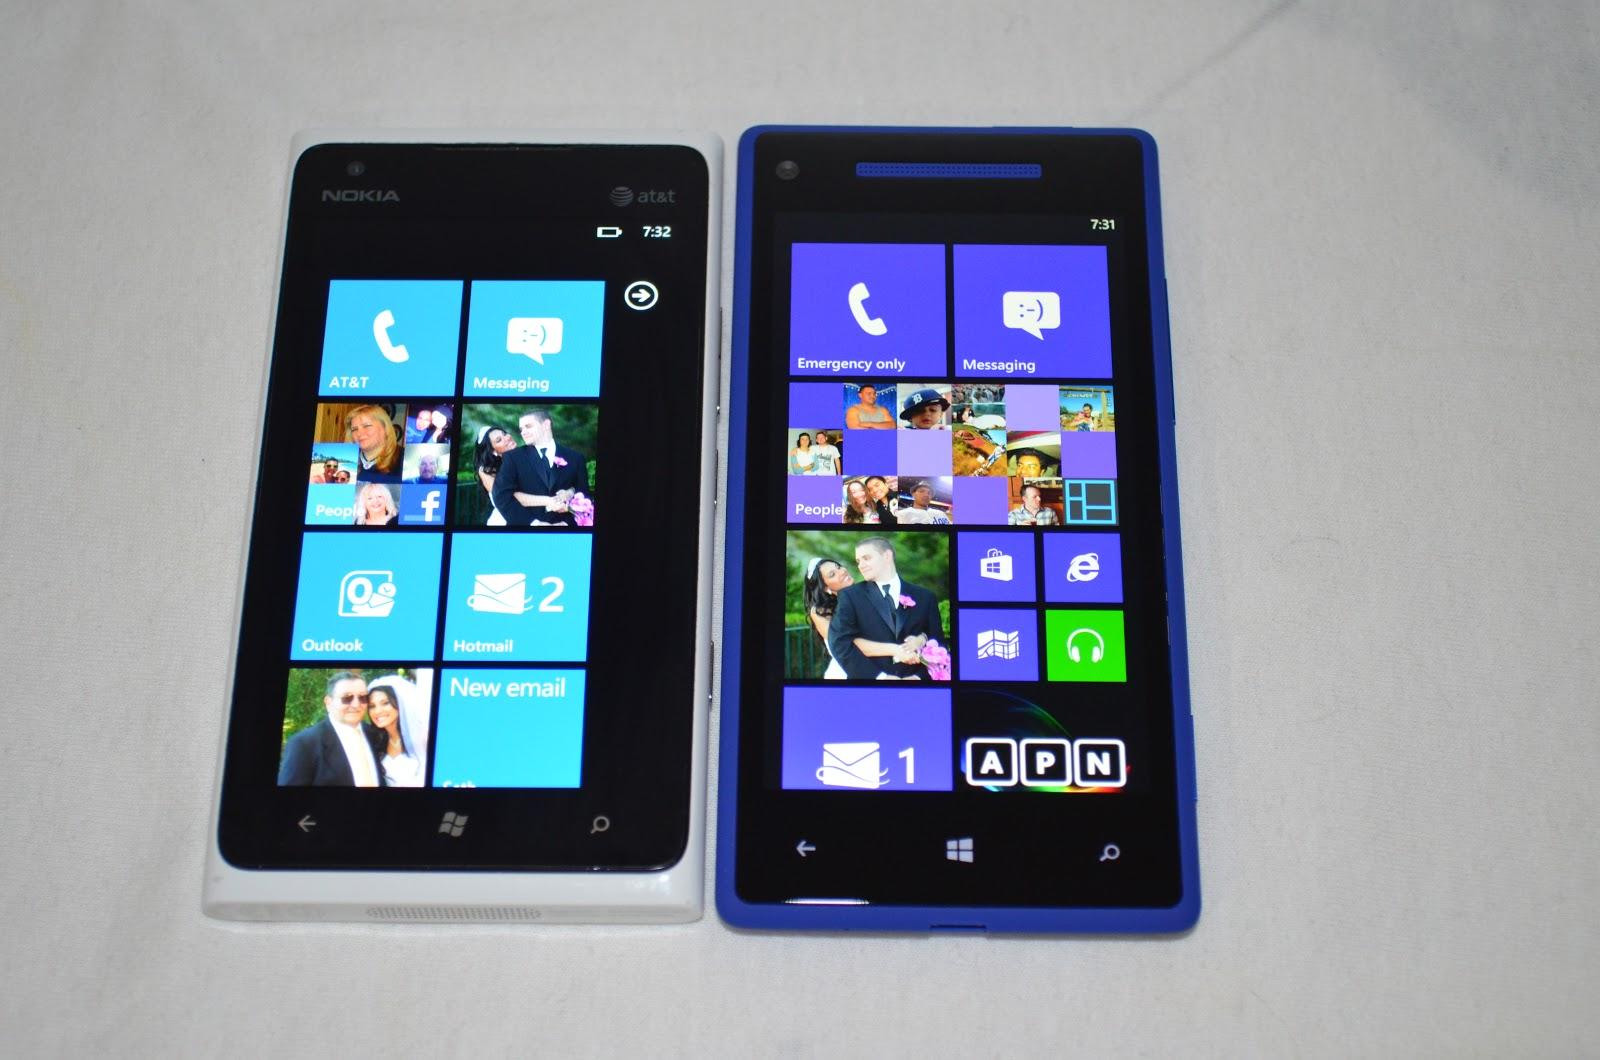 http://1.bp.blogspot.com/-gVn0j7p7syk/UJRMnbRCiPI/AAAAAAAAOj0/sTF9u18APz0/s1600/HTC%20Windows%20Phone%208X%20Hands-on%20AllPhoneNews%20(7).JPG